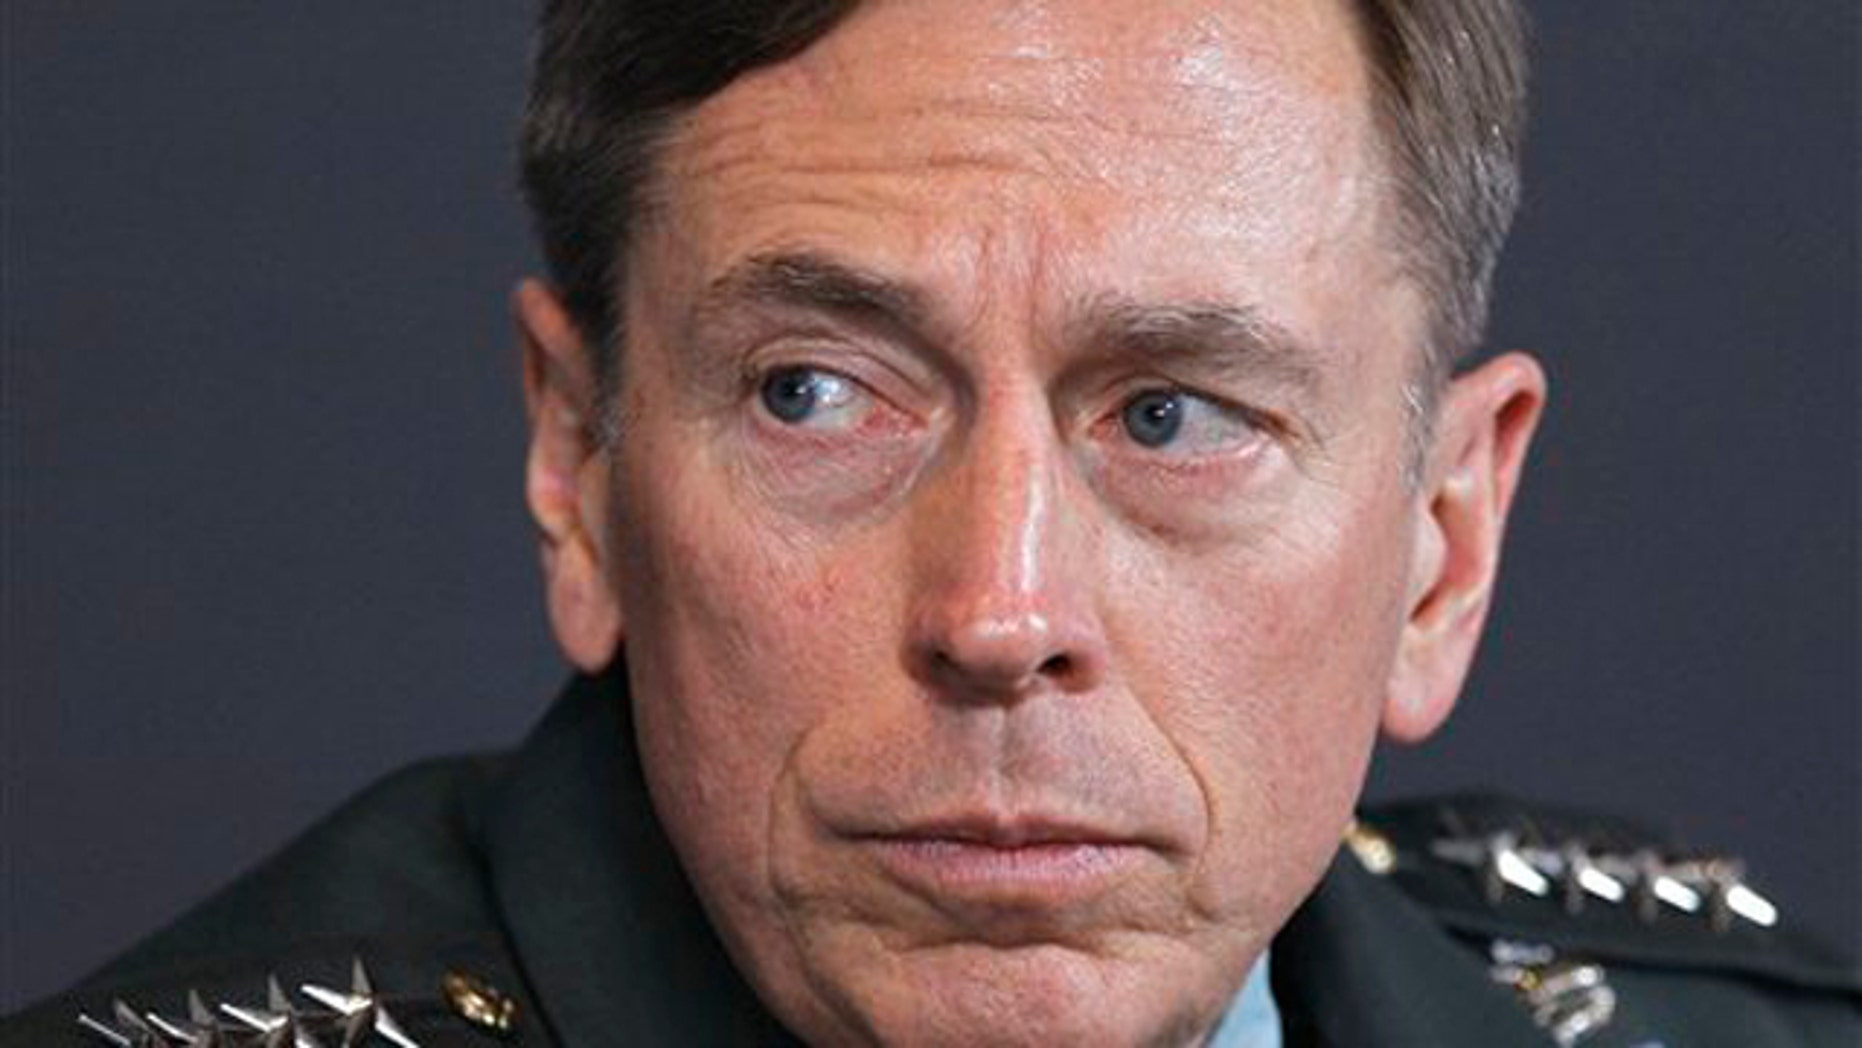 In this March 18 file photo, Gen. David Petraeus is seen in Washington.